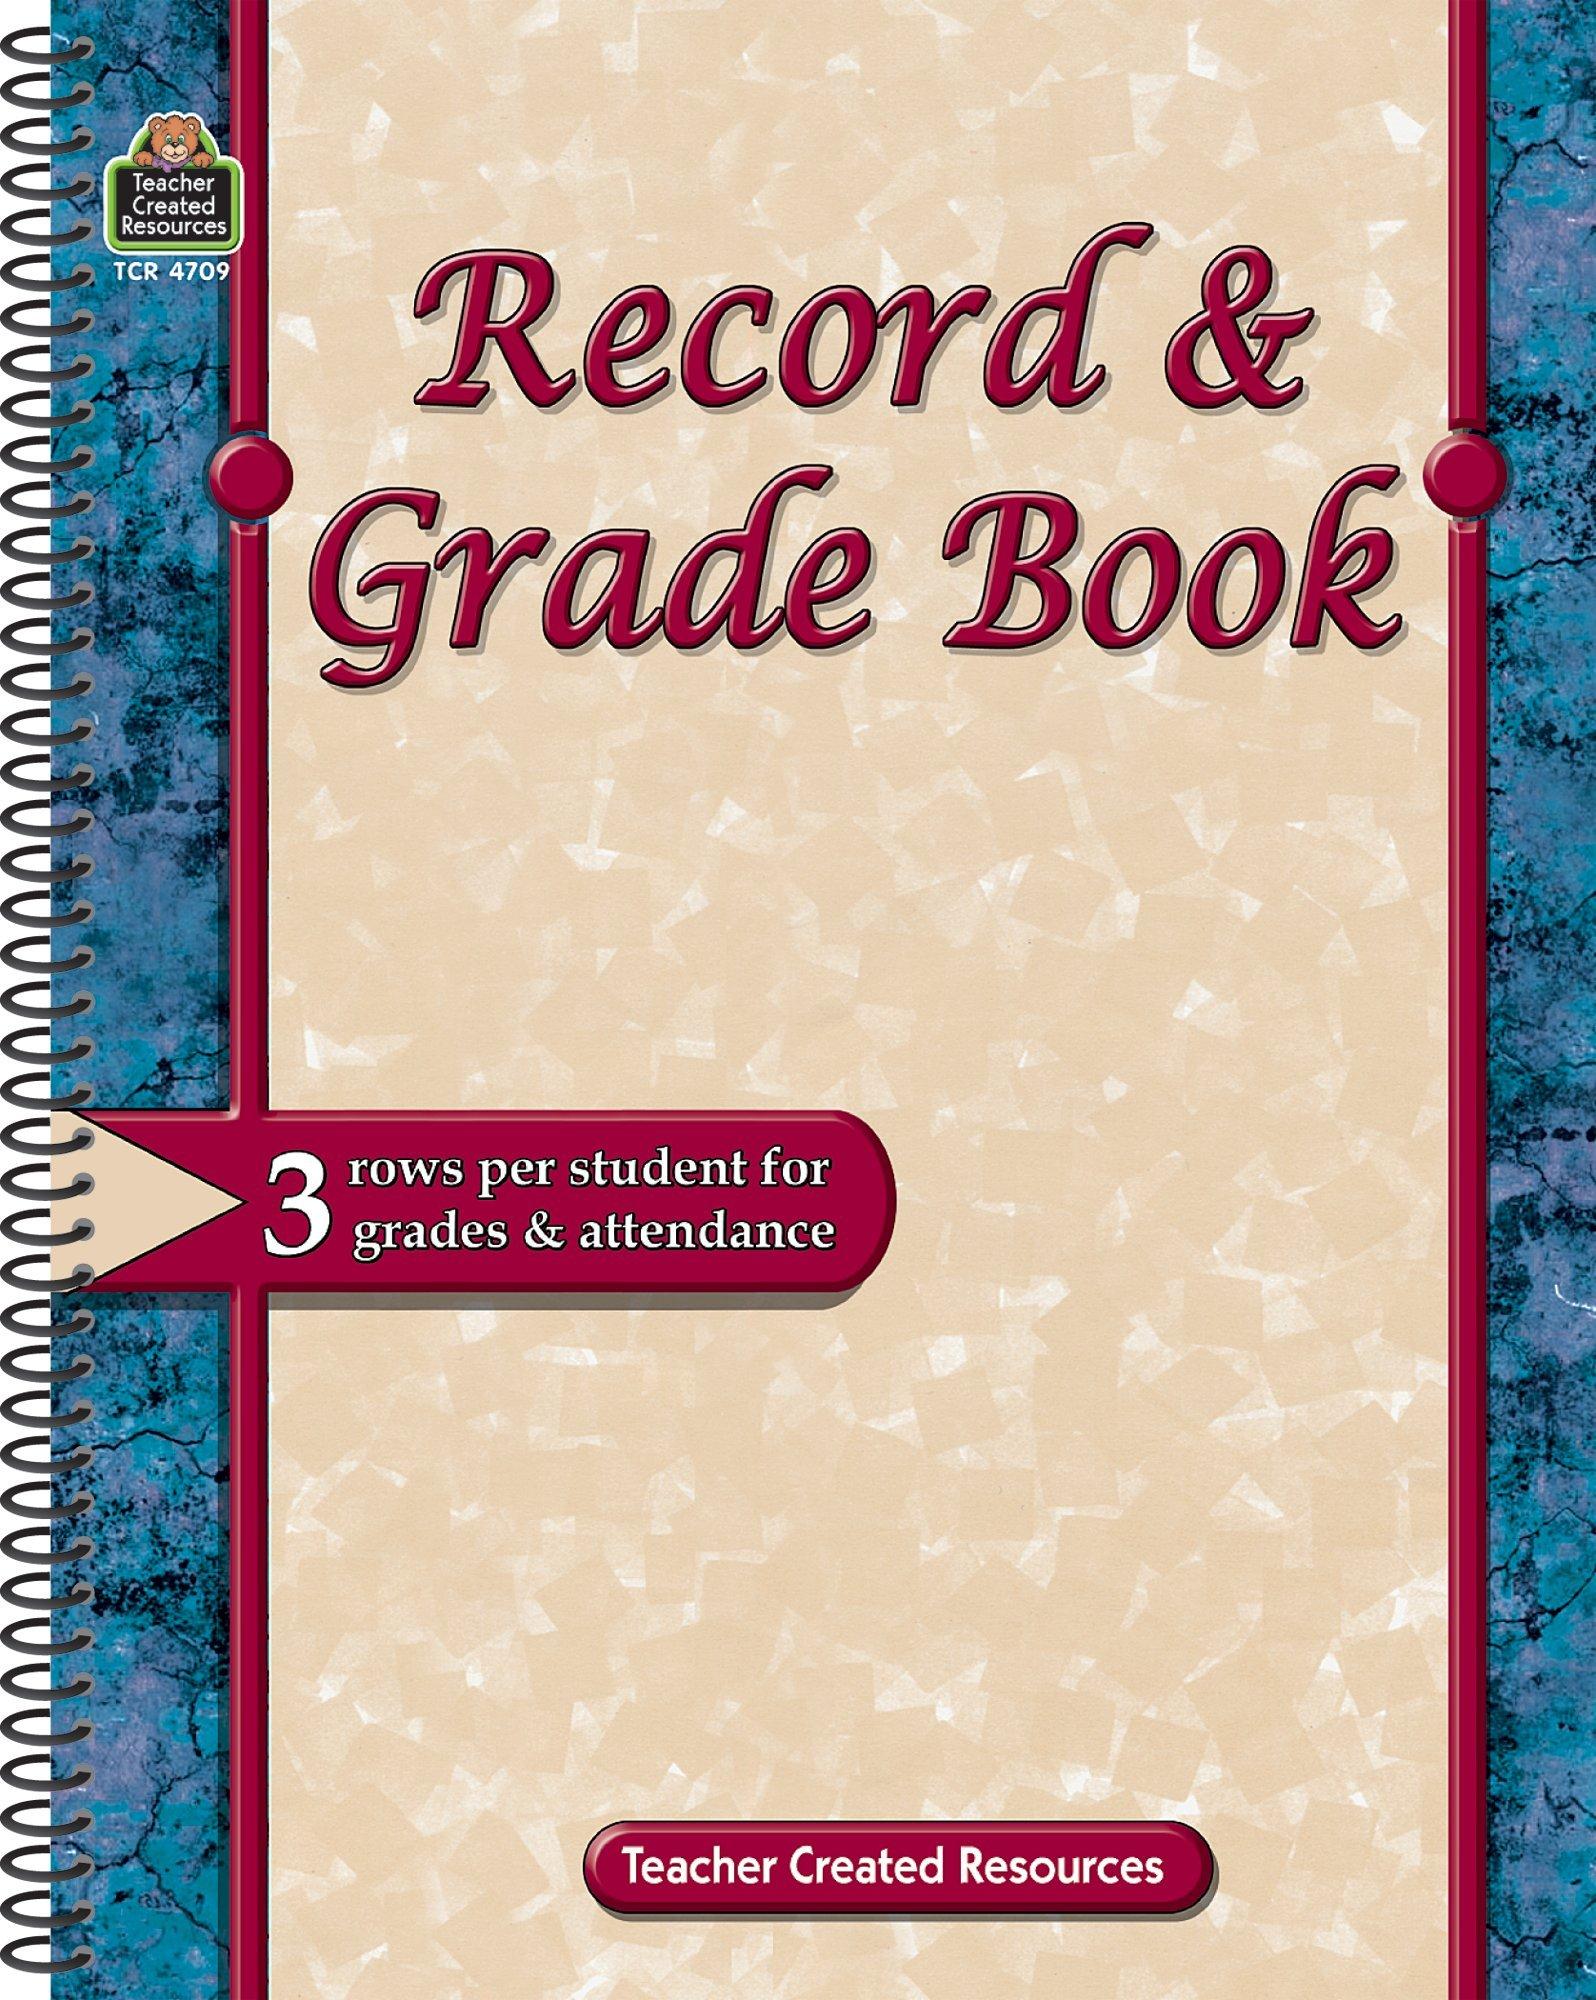 record grade book teacher created resources staff 9781420647099